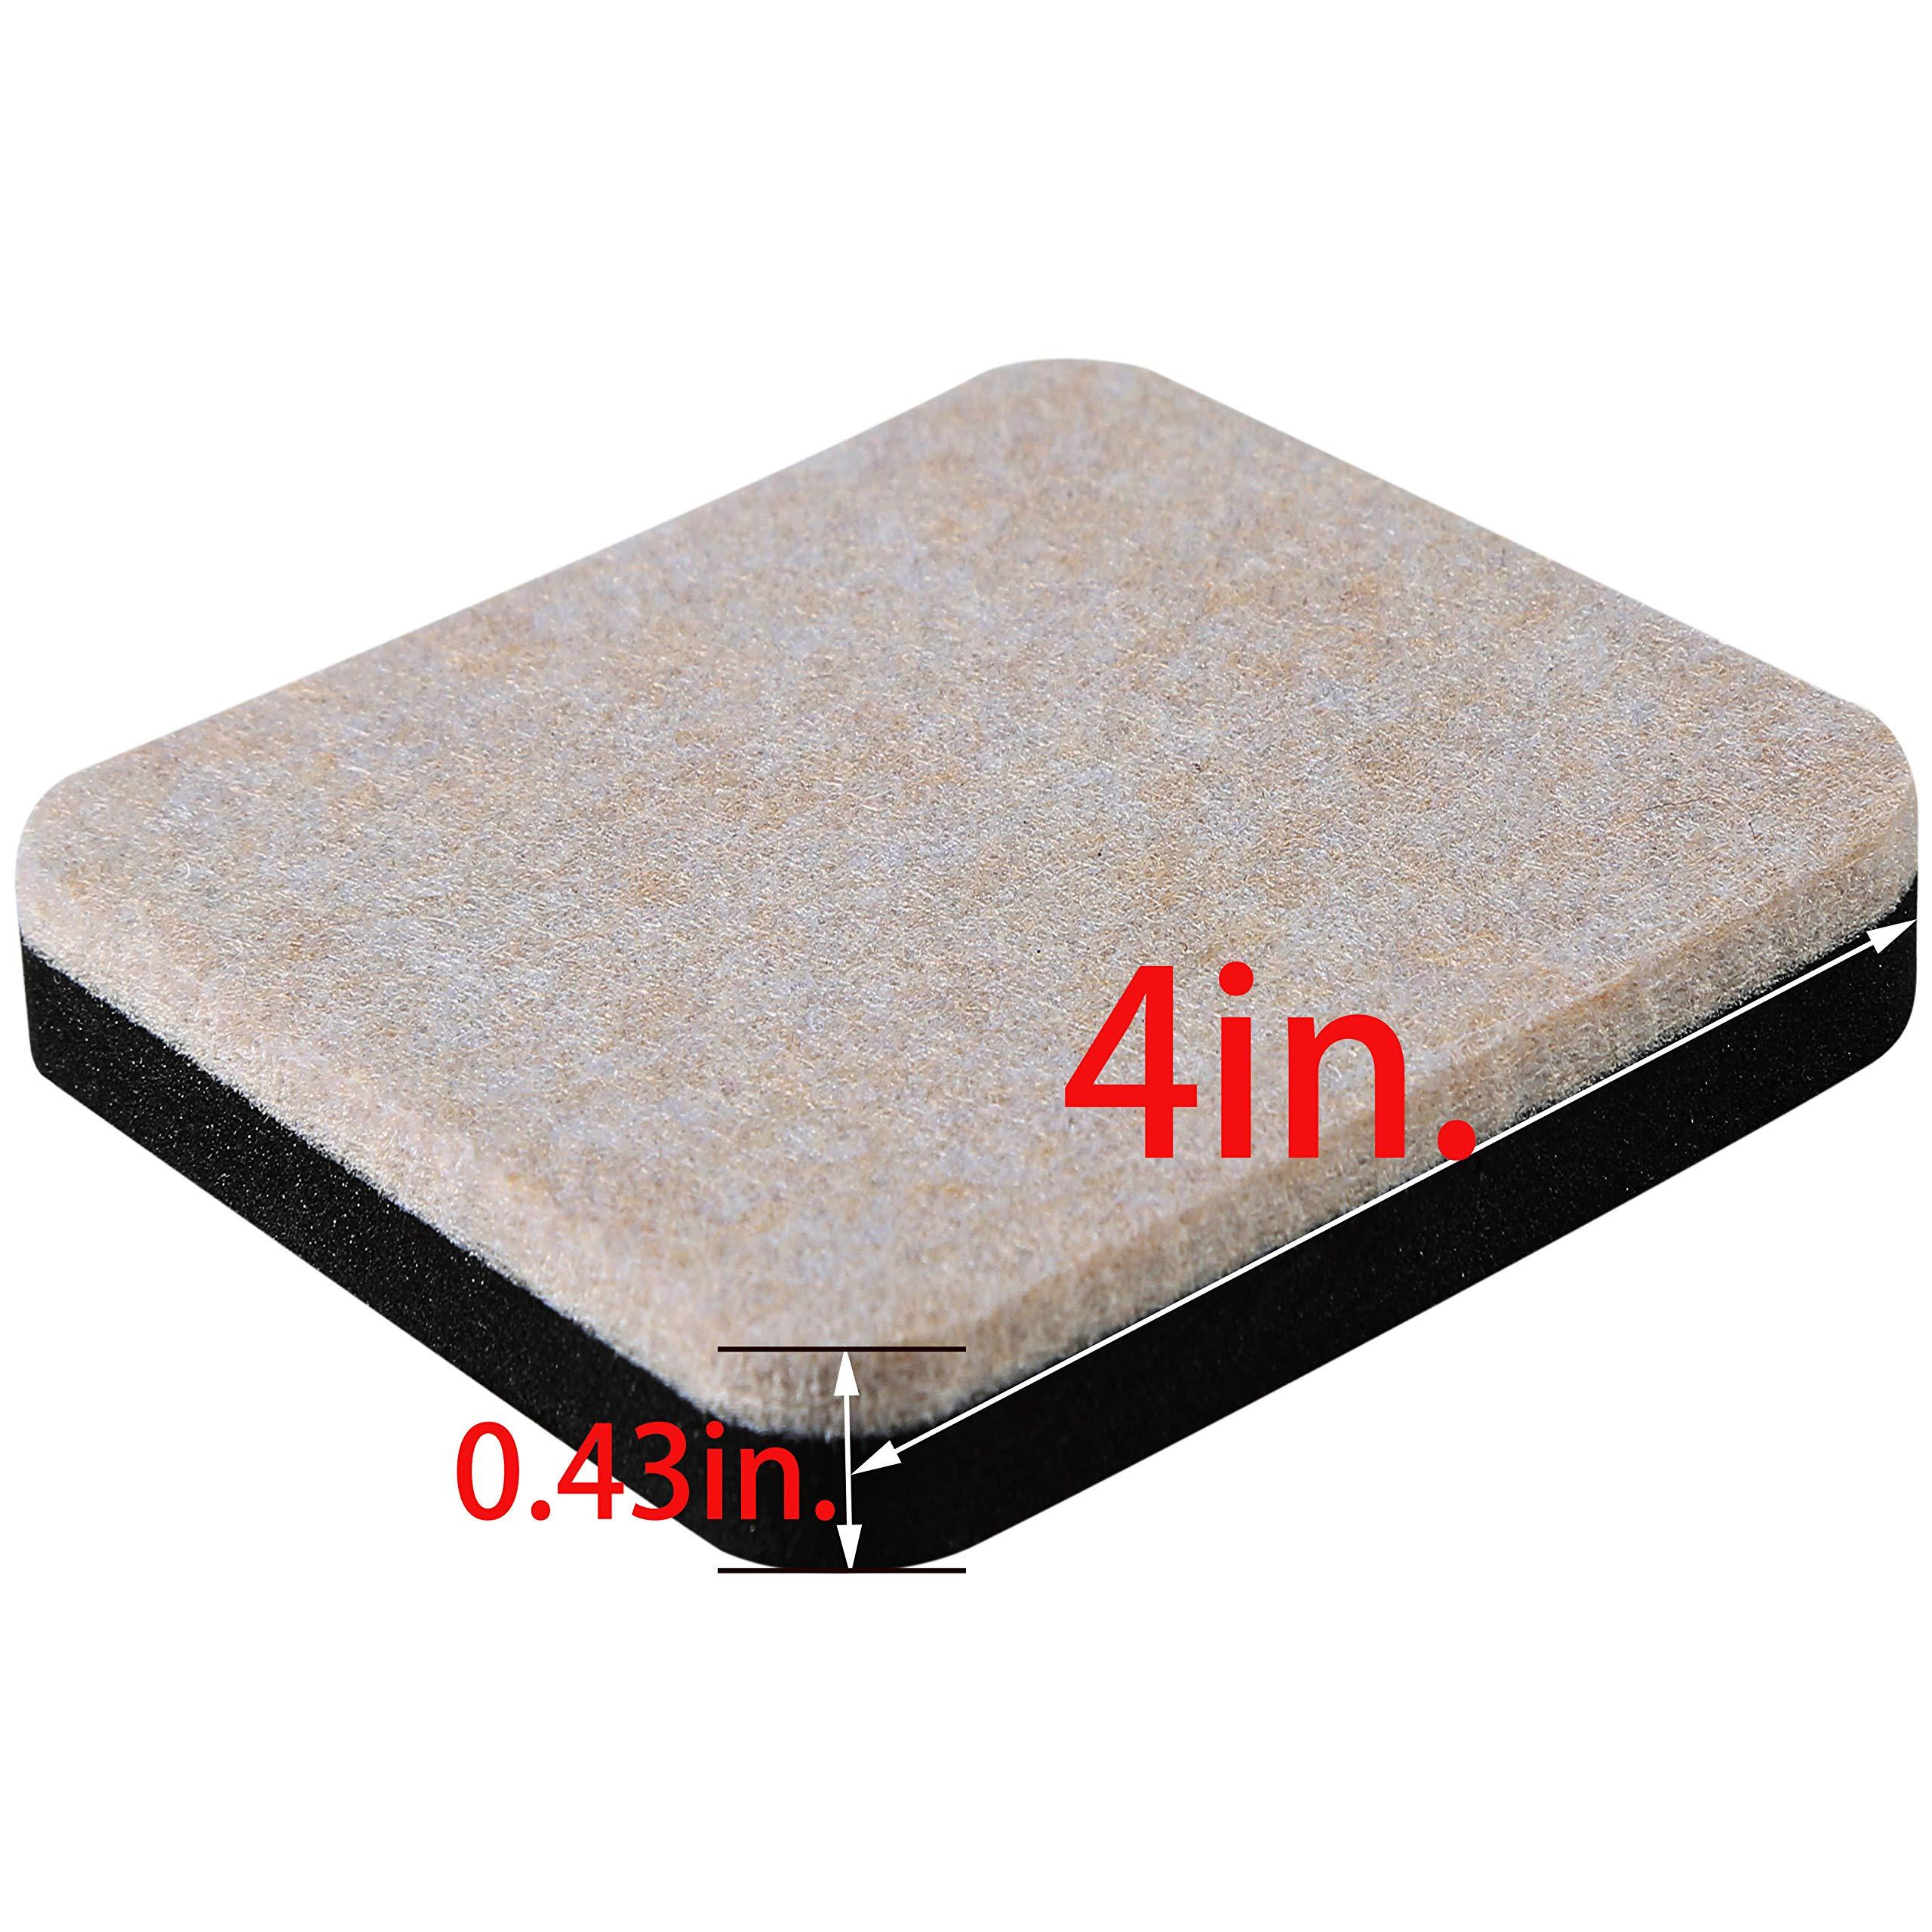 Liyic 4in.Square 16 Pack Felt Sliders for Hard Surfaces-Felt Furniture Sliders - Heavy Duty Sliders - Reusable Hardwood Floor Sliders -Furniture Moving Sliders-Sofa Sliders Gliders Glides Movers by Liyic (Image #2)